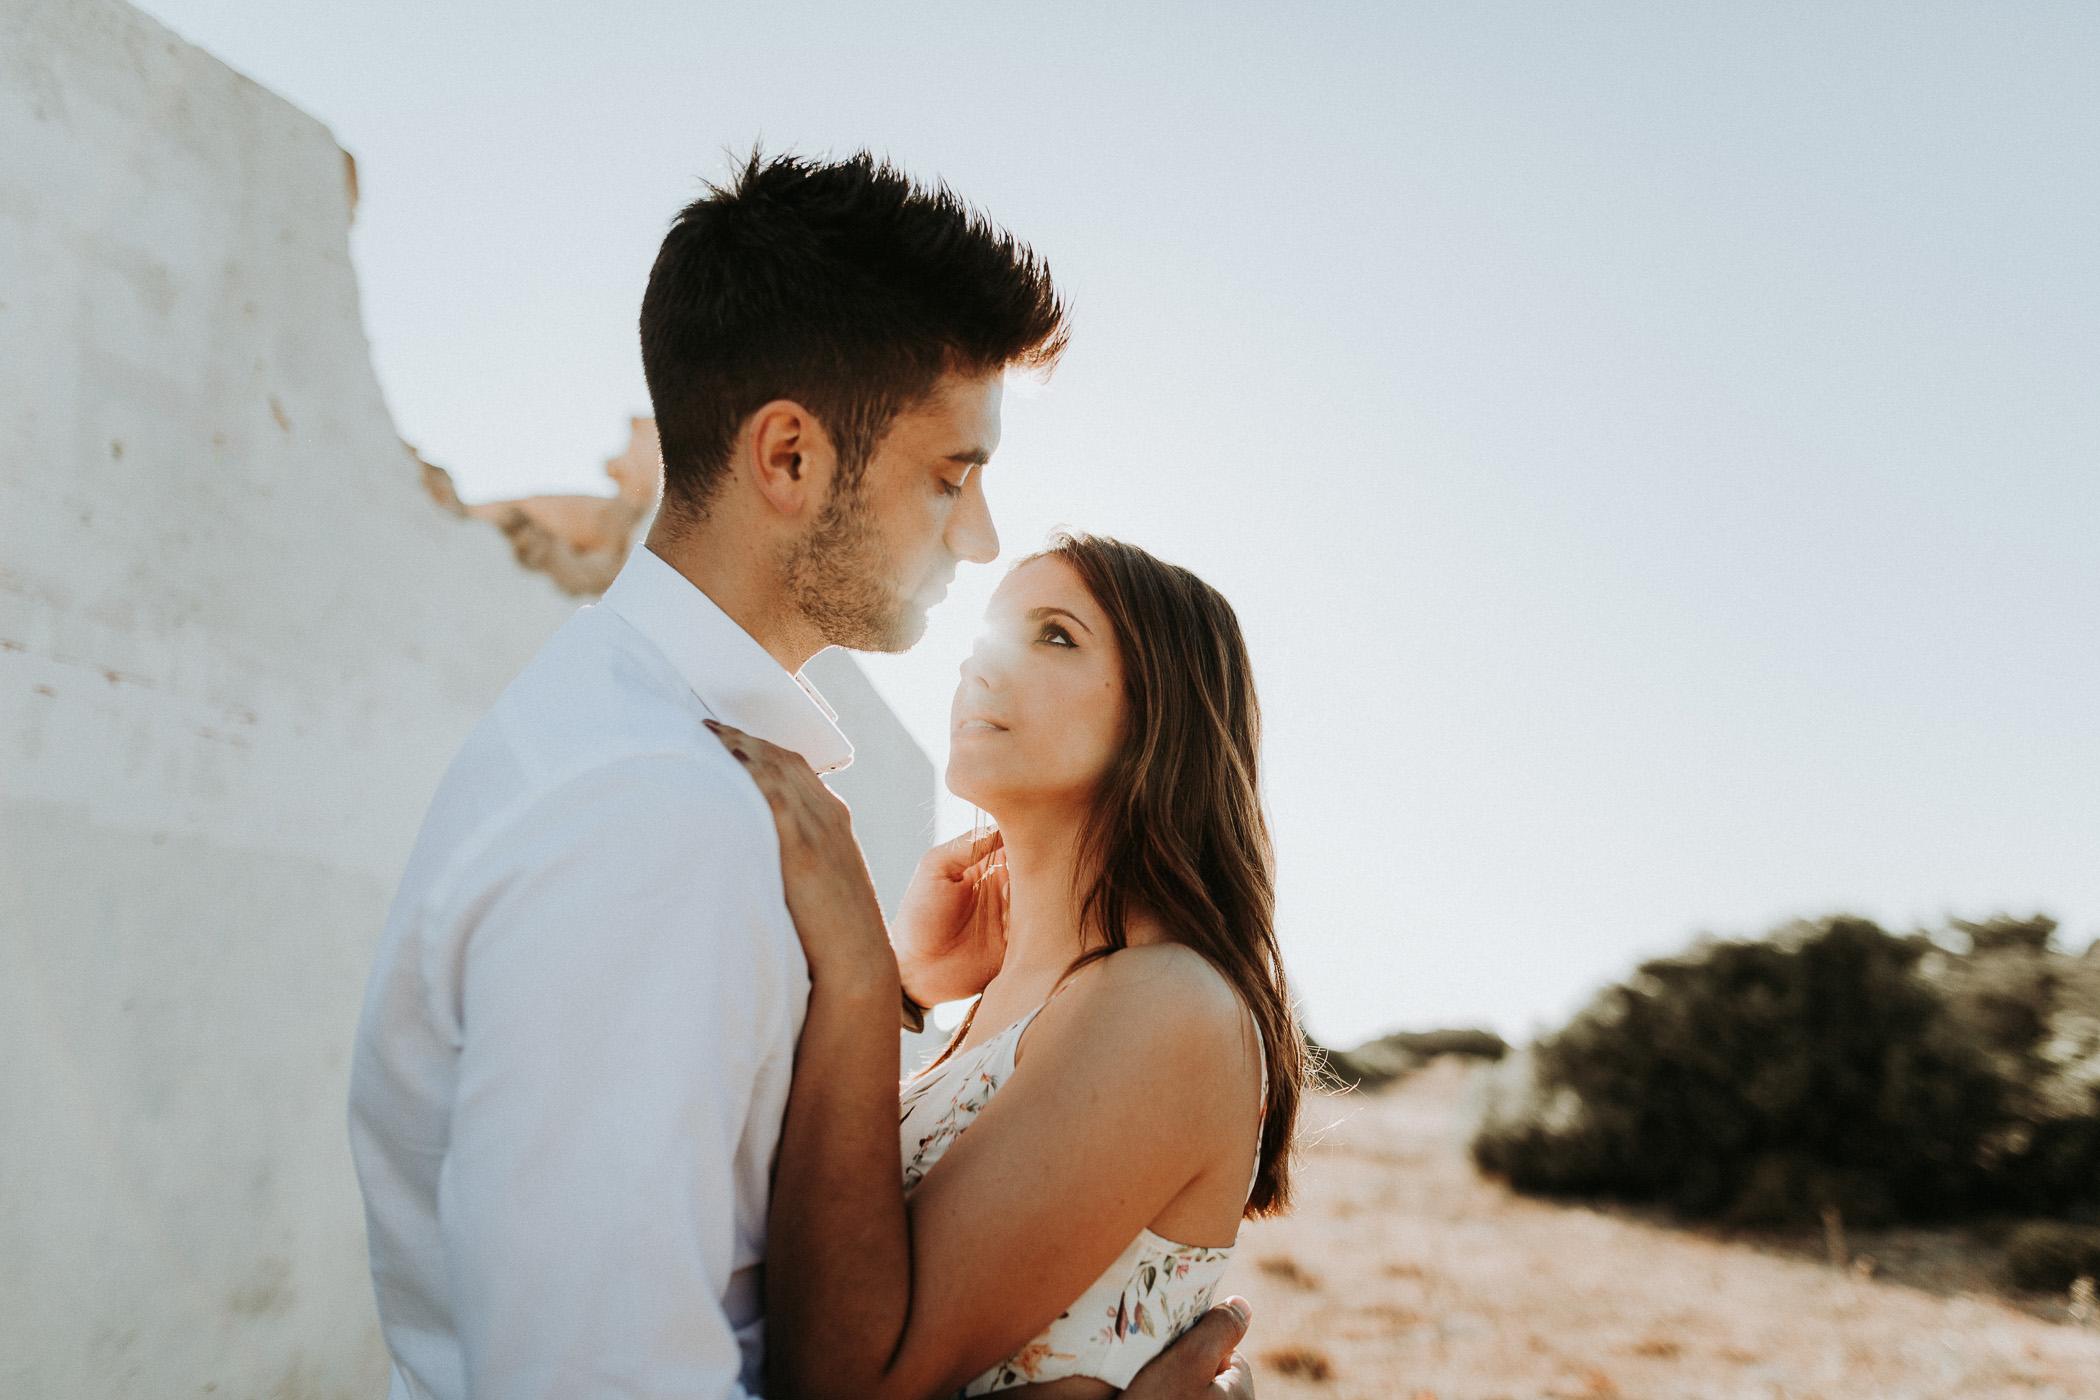 DanielaMarquardtPhotography_wedding_elopement_mallorca_spain_calapi_palma_lauraandtoni_364